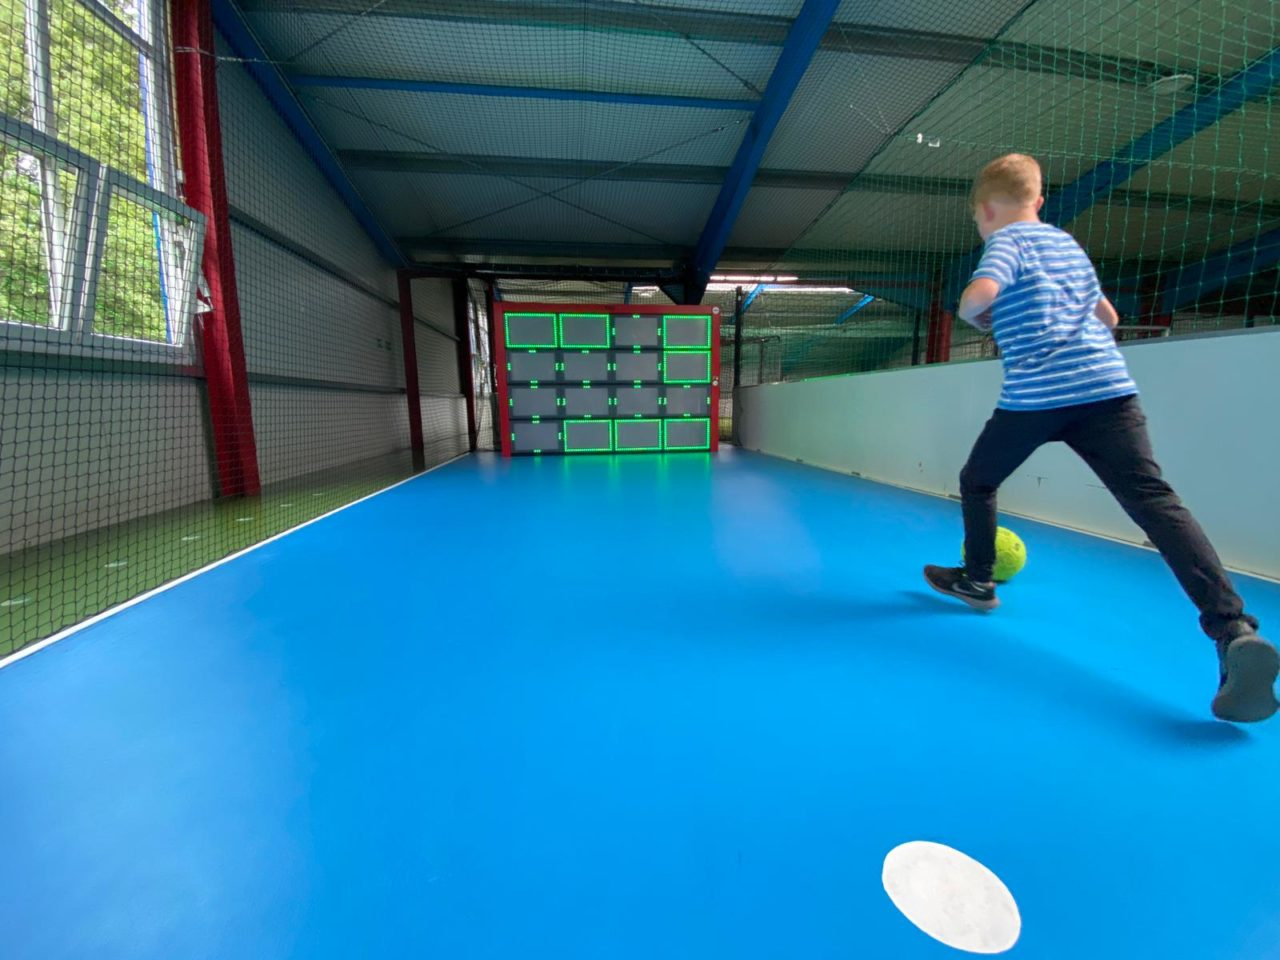 Yalp Sutu - Fußballwand - Im Freizeitpark